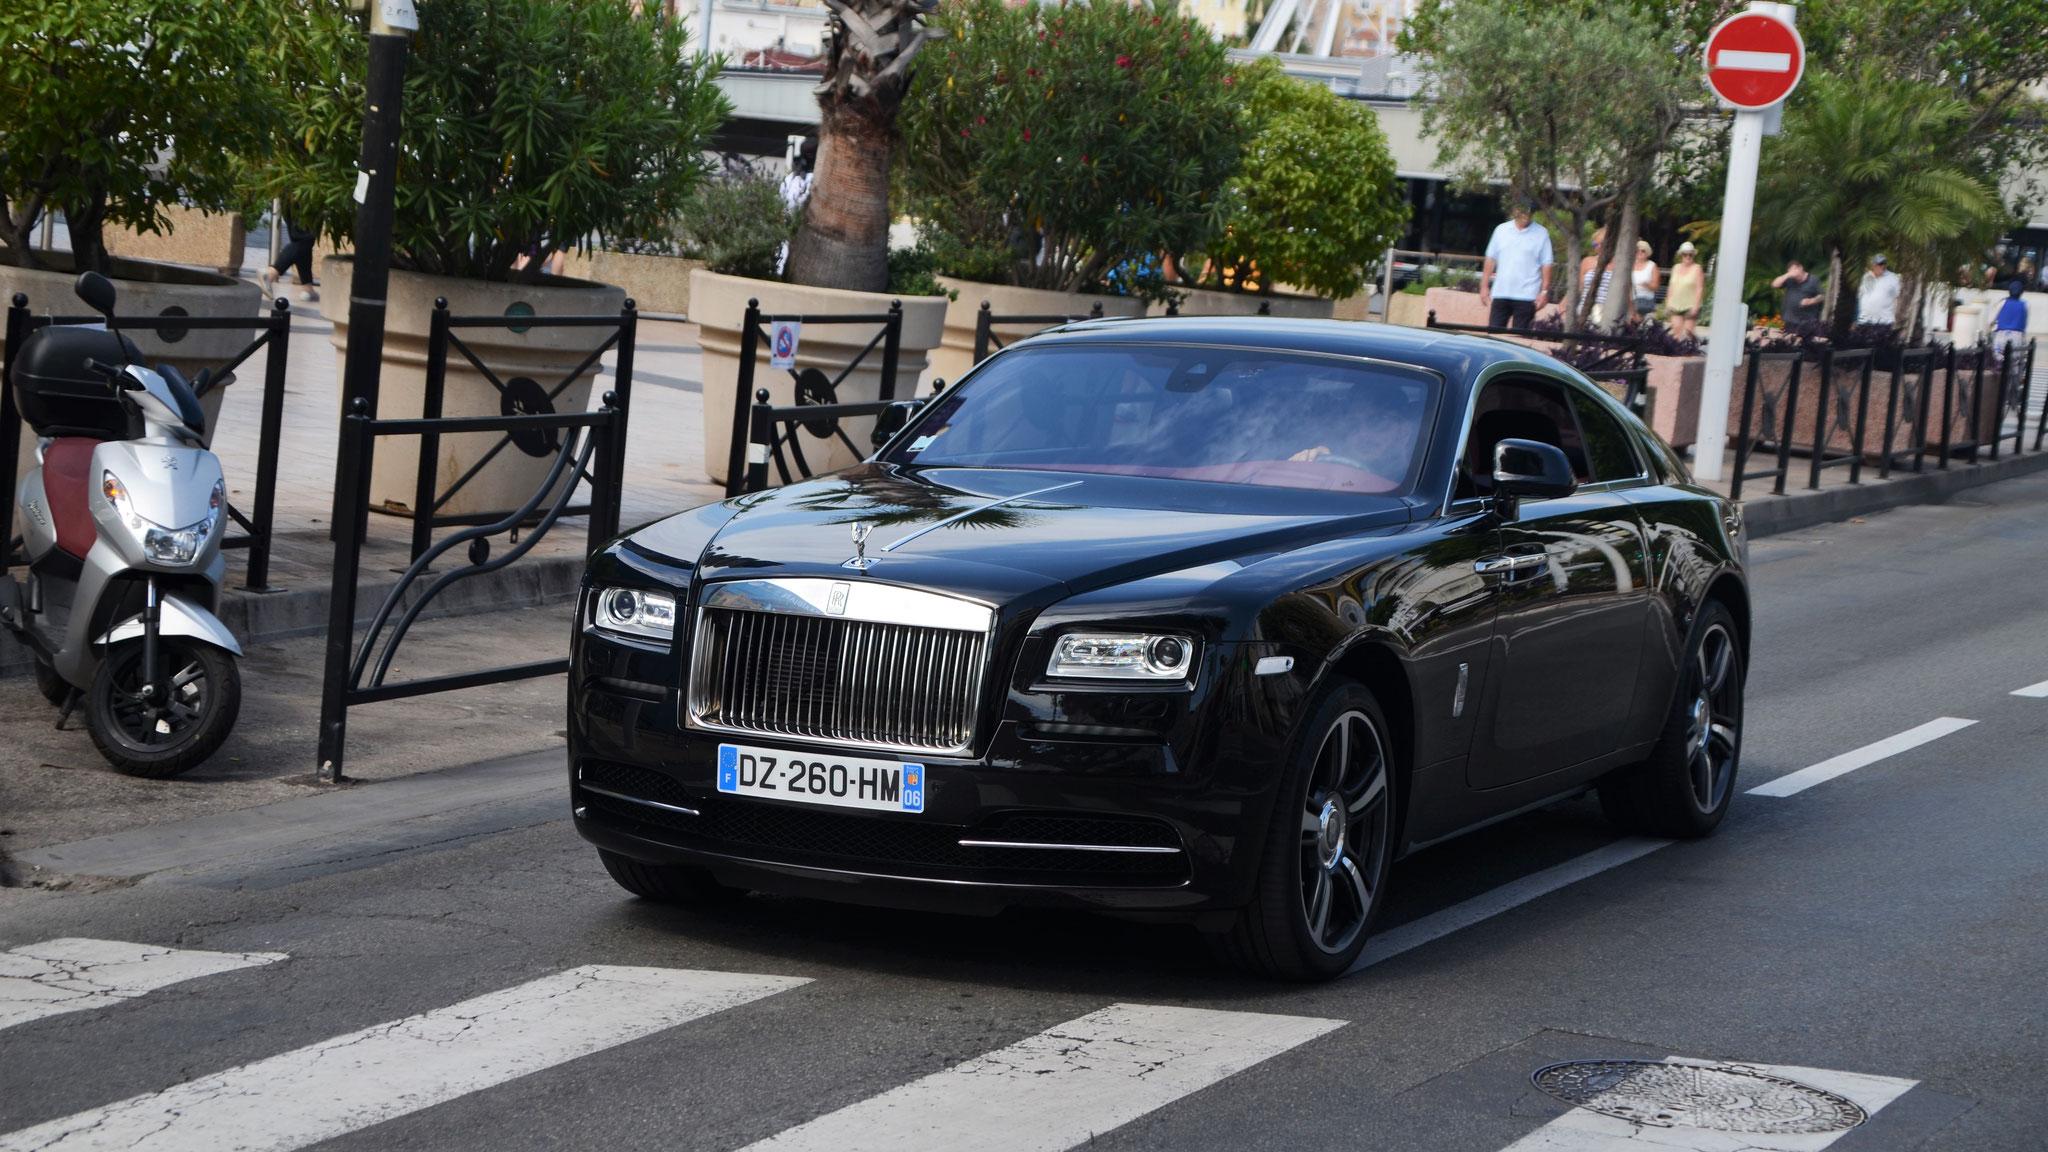 Rolls Royce Wraith - DZ-260-HM-06 (FRA)